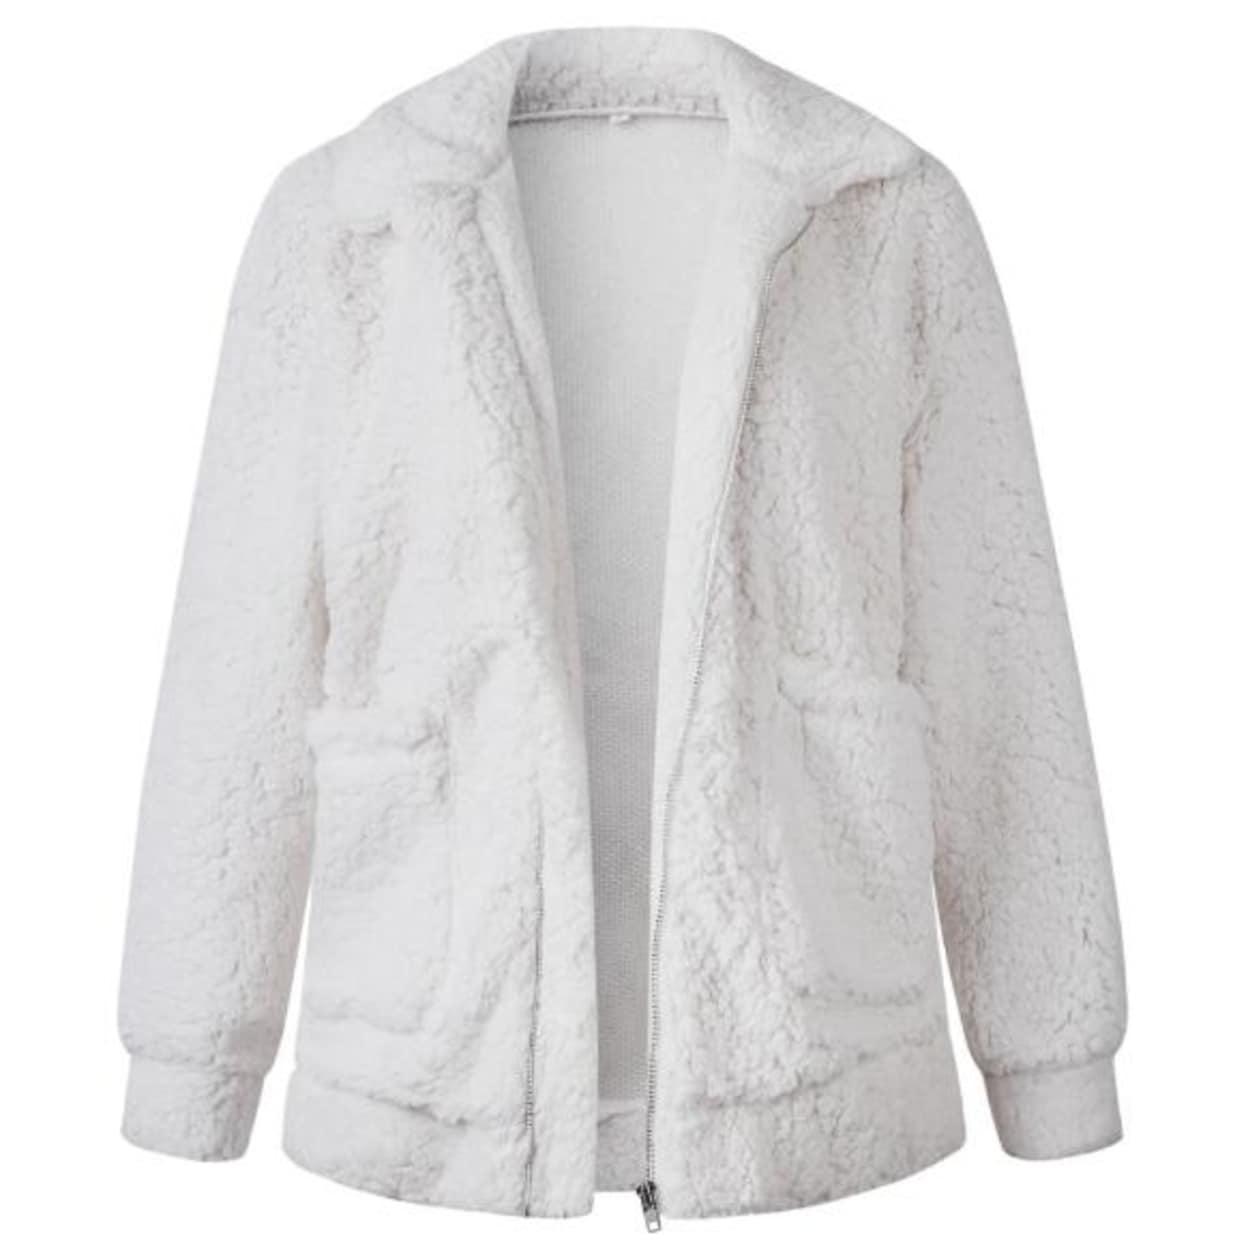 Lady Jacket Cardigan Coat Faux Sherpa Fleece Warm Winter Stand Collar Fluffy Top